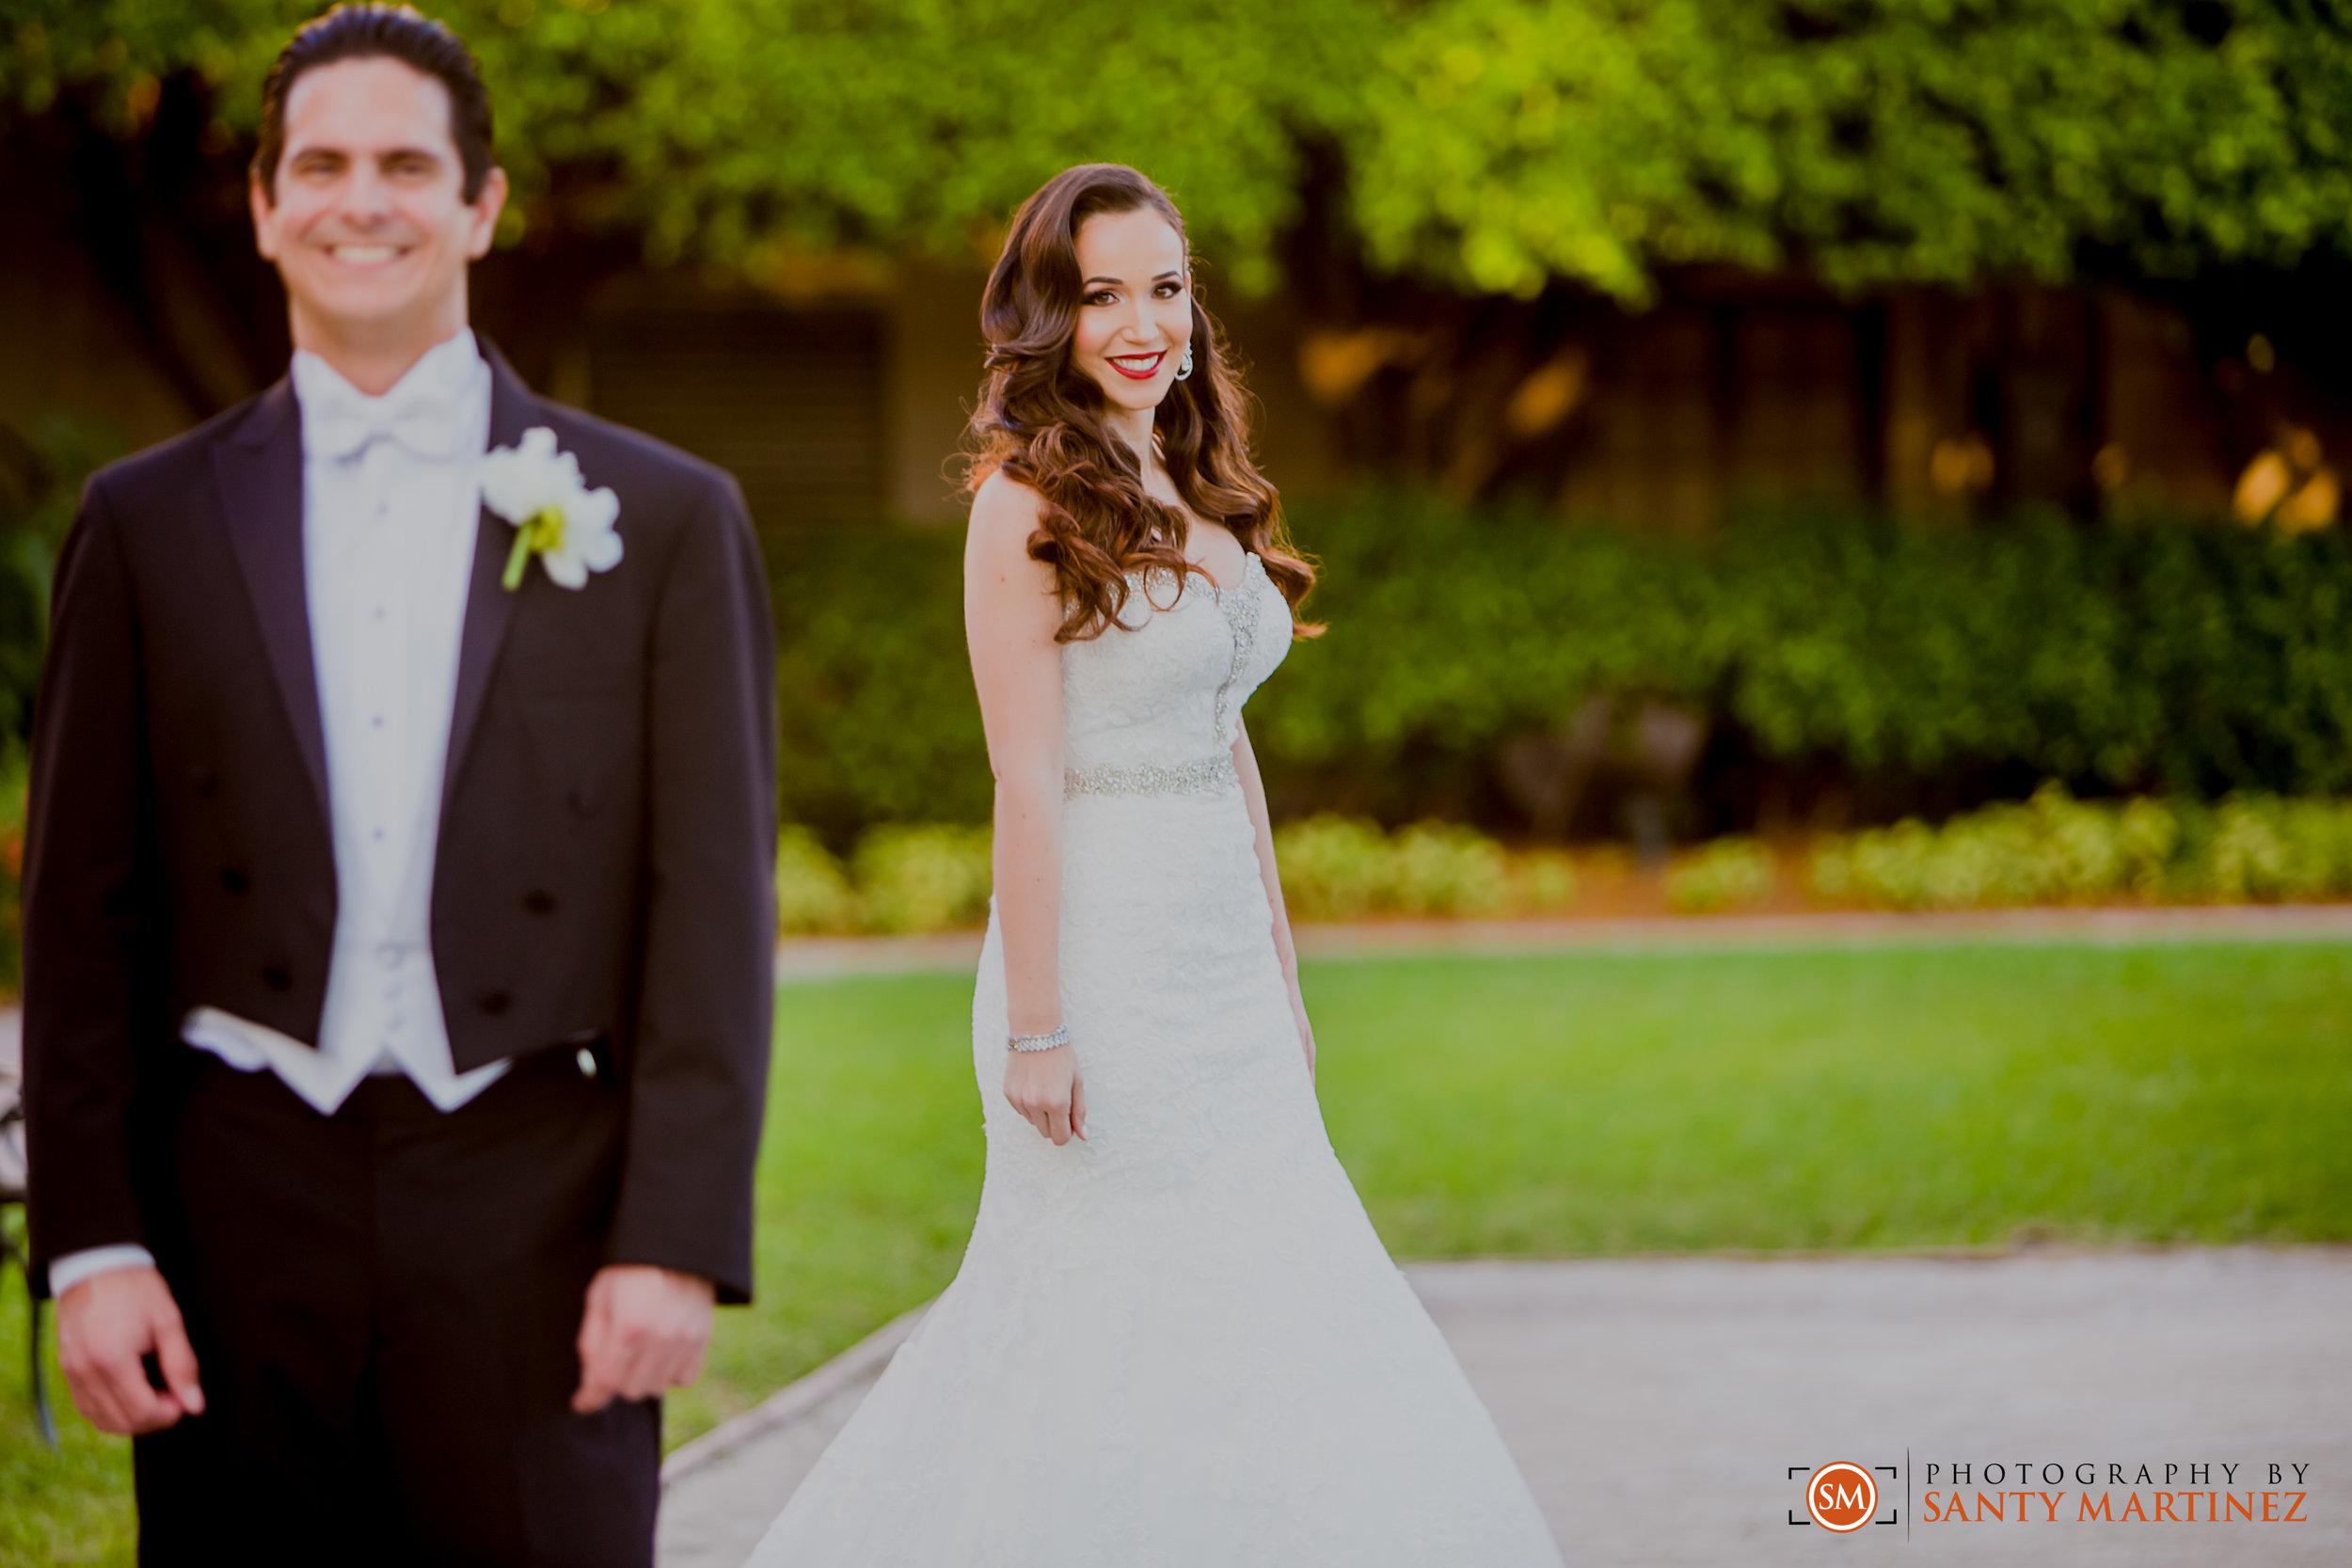 Miami Wedding Photographer - Santy Martinez-18.jpg